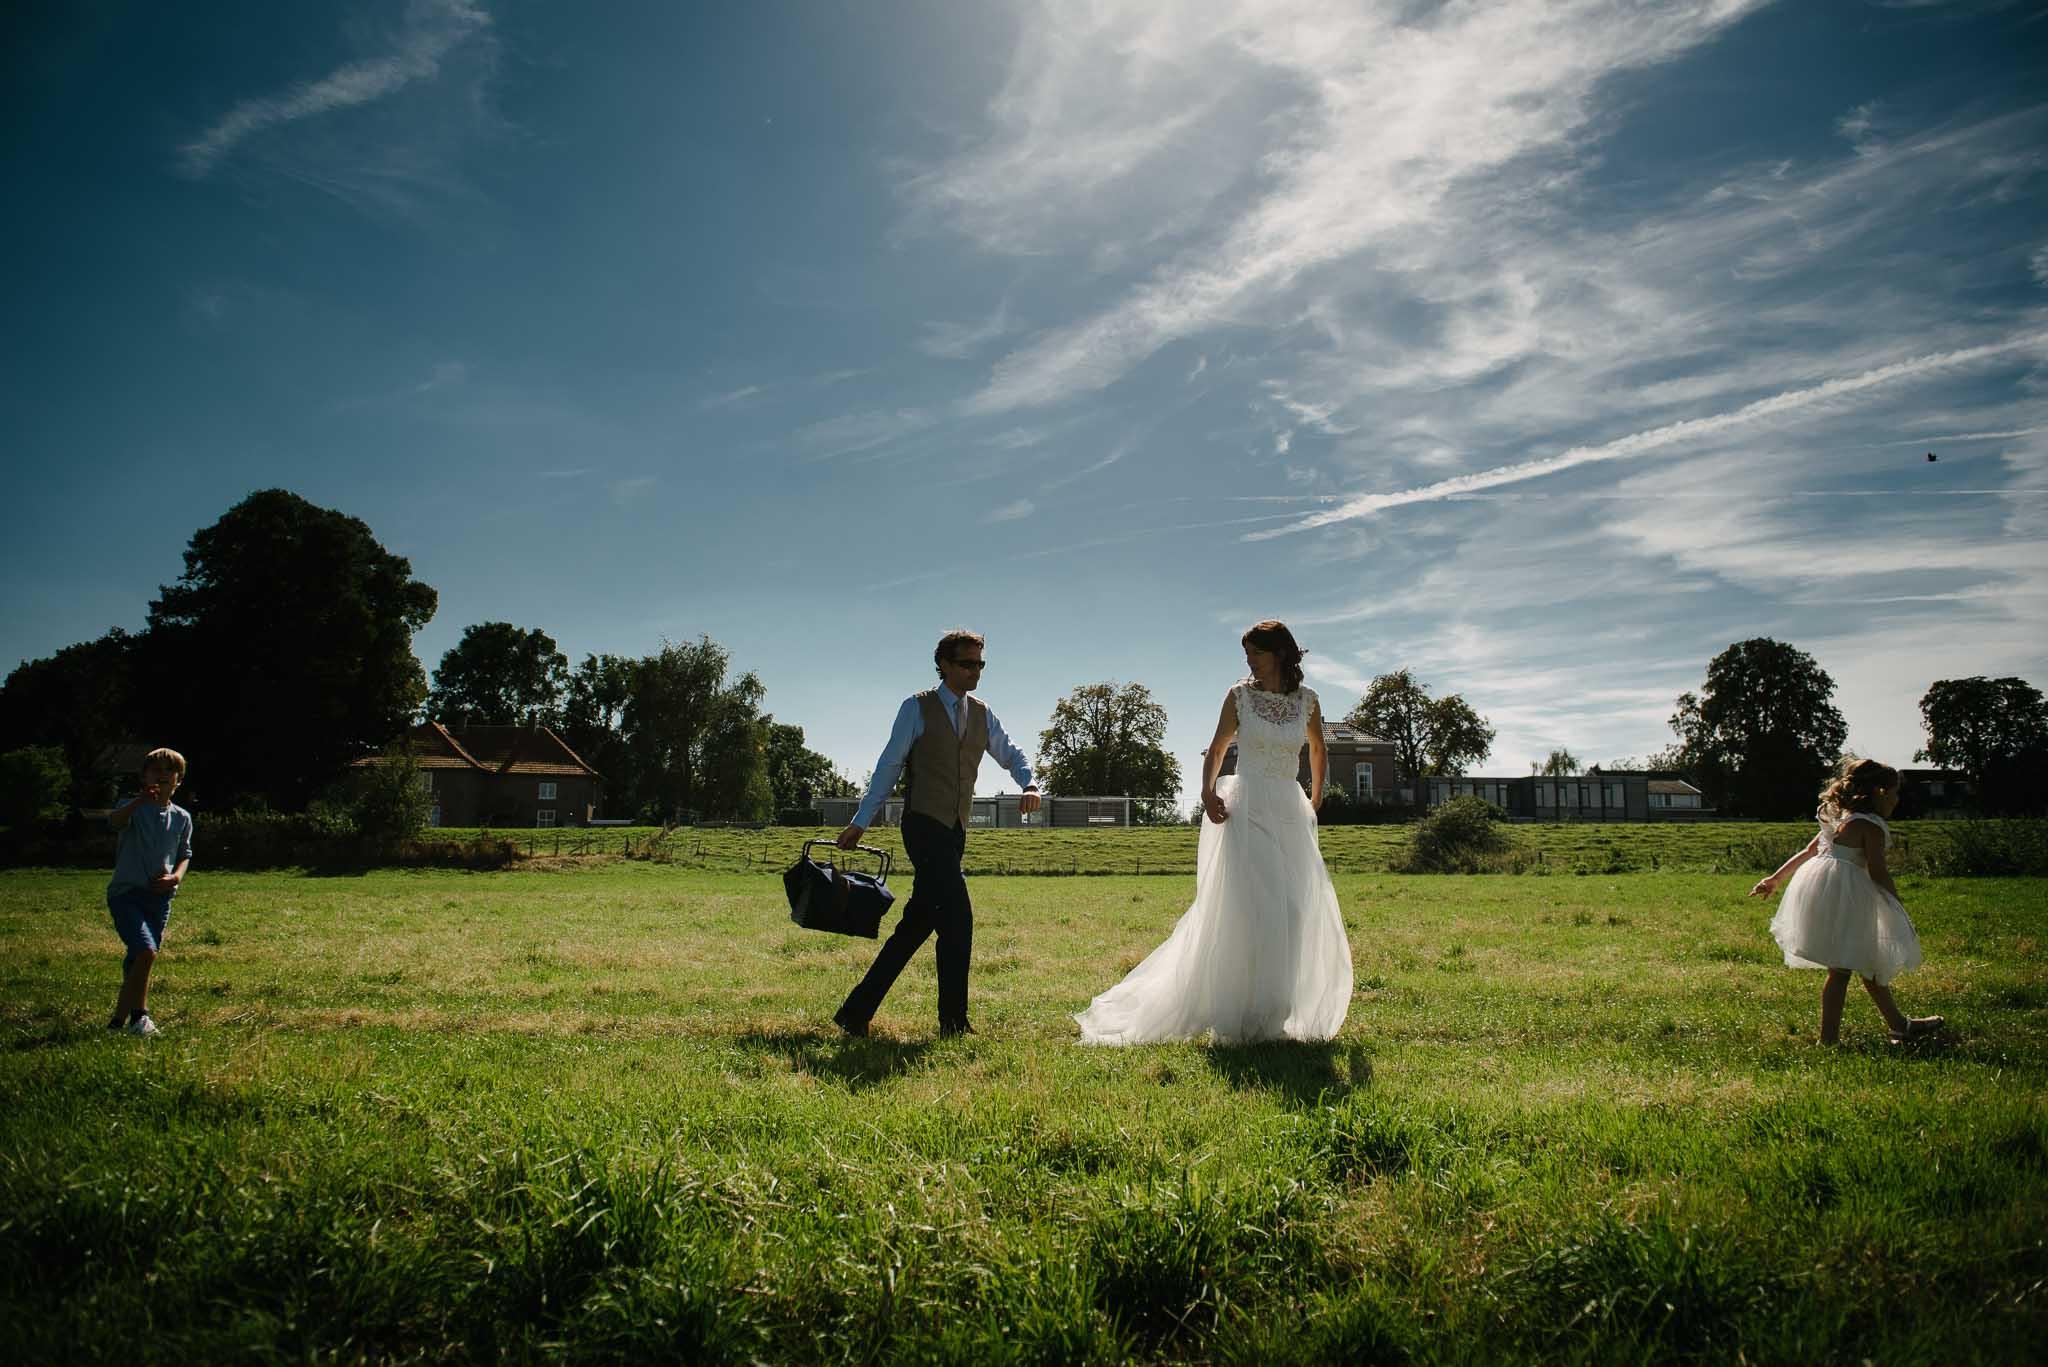 fotoshoot bruidsfotograaf Arnhemv